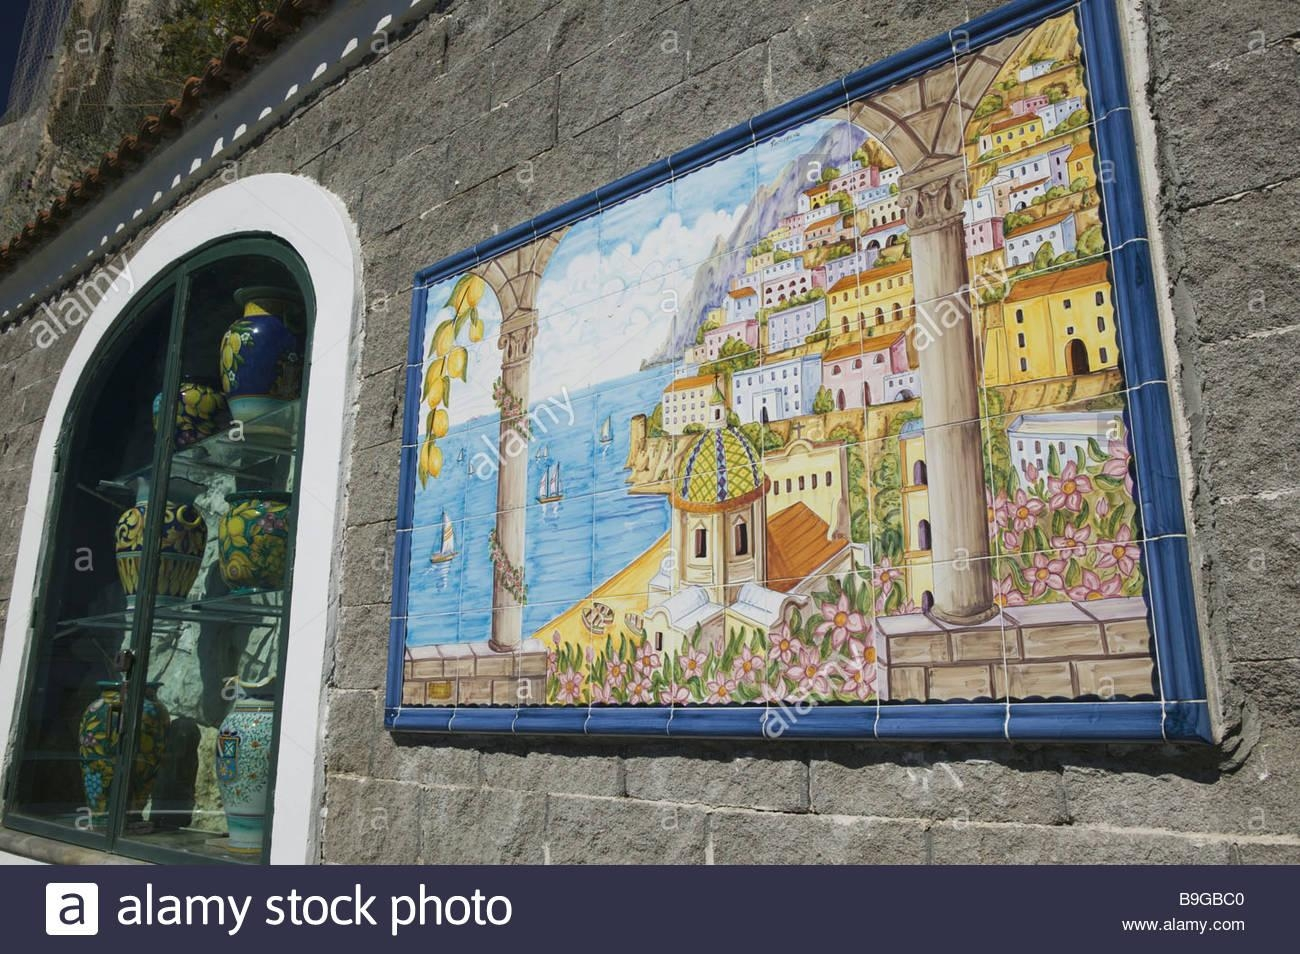 Italy Campania Amalfi Coast Positano Wall Tile Picture City View With Italian Coast Wall Art (Image 9 of 20)